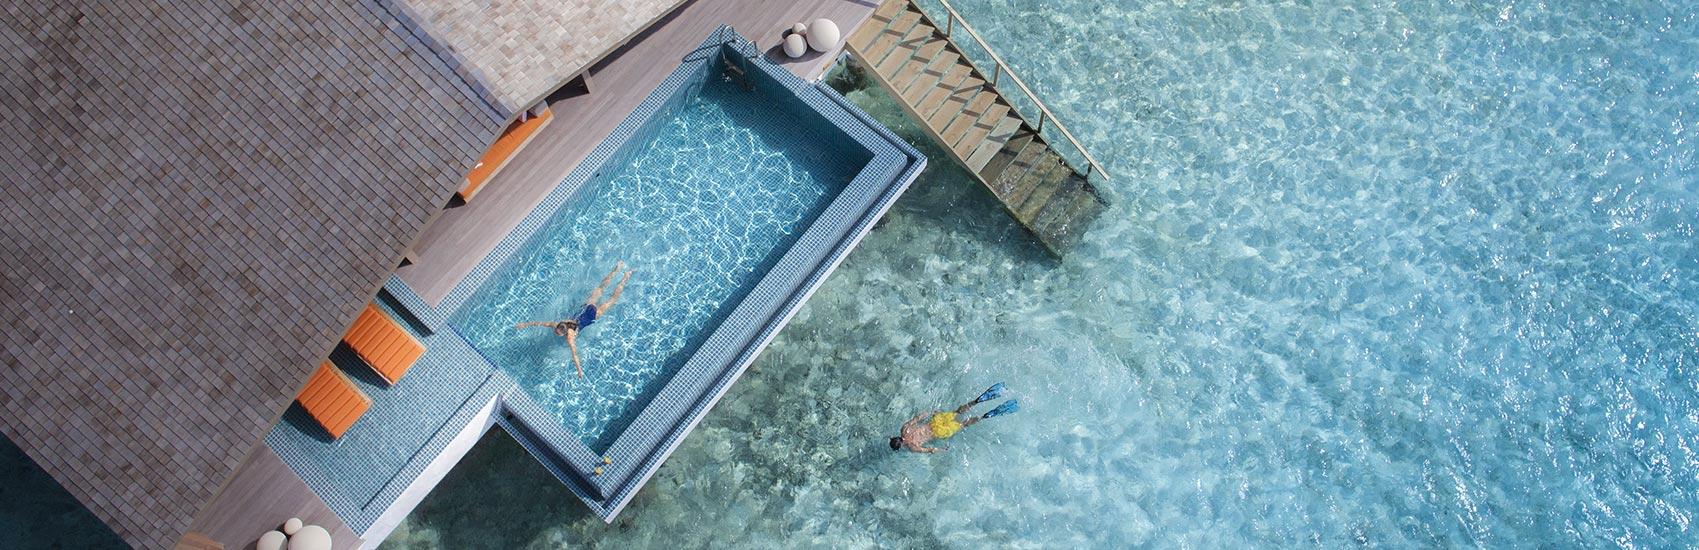 Club Med Early Booking Savings 2